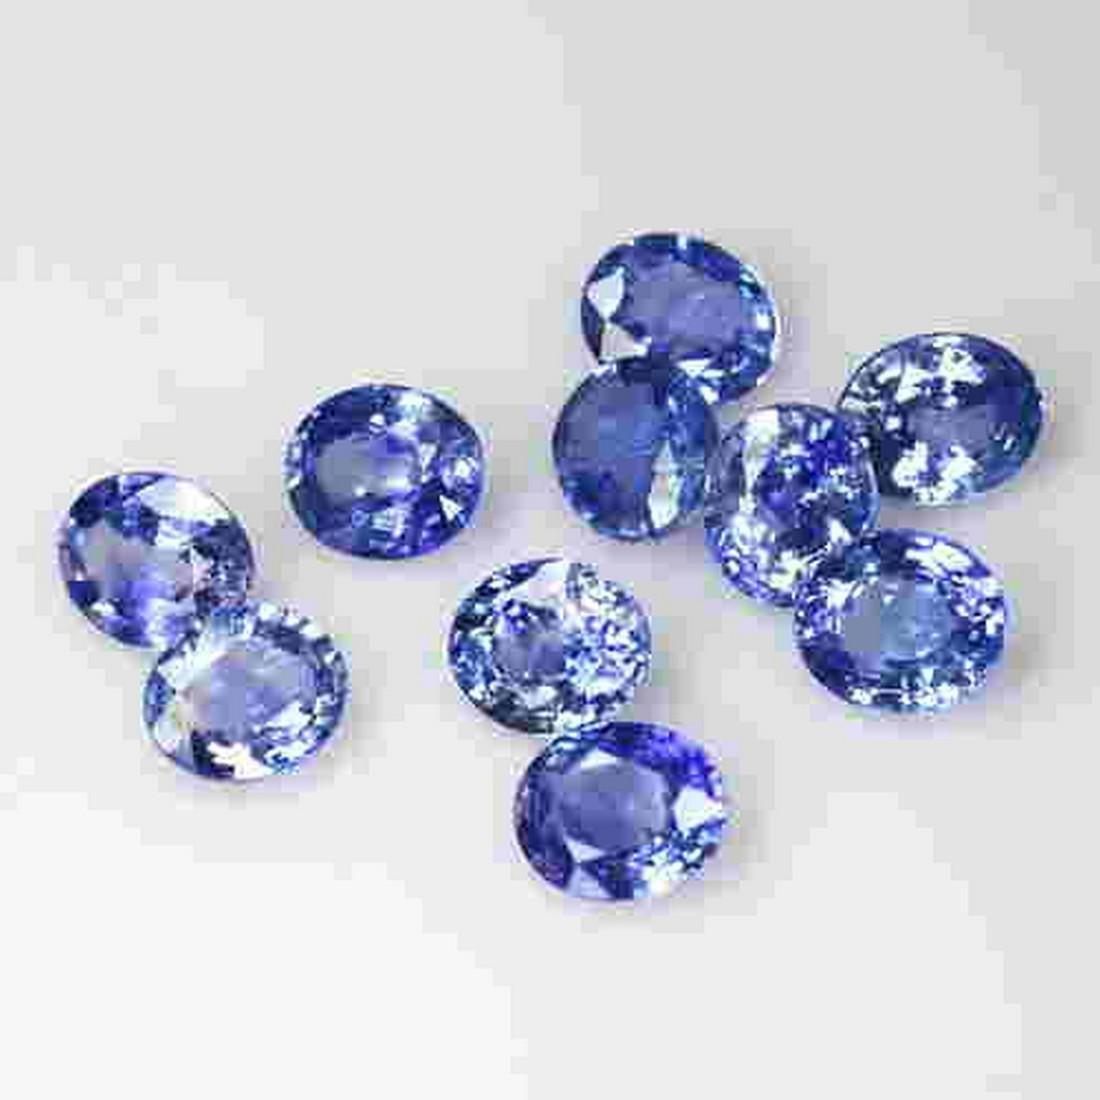 10 PCS 7.60 CTS NATURAL SRI LANKA BLUE SAPPHIRE OVAL